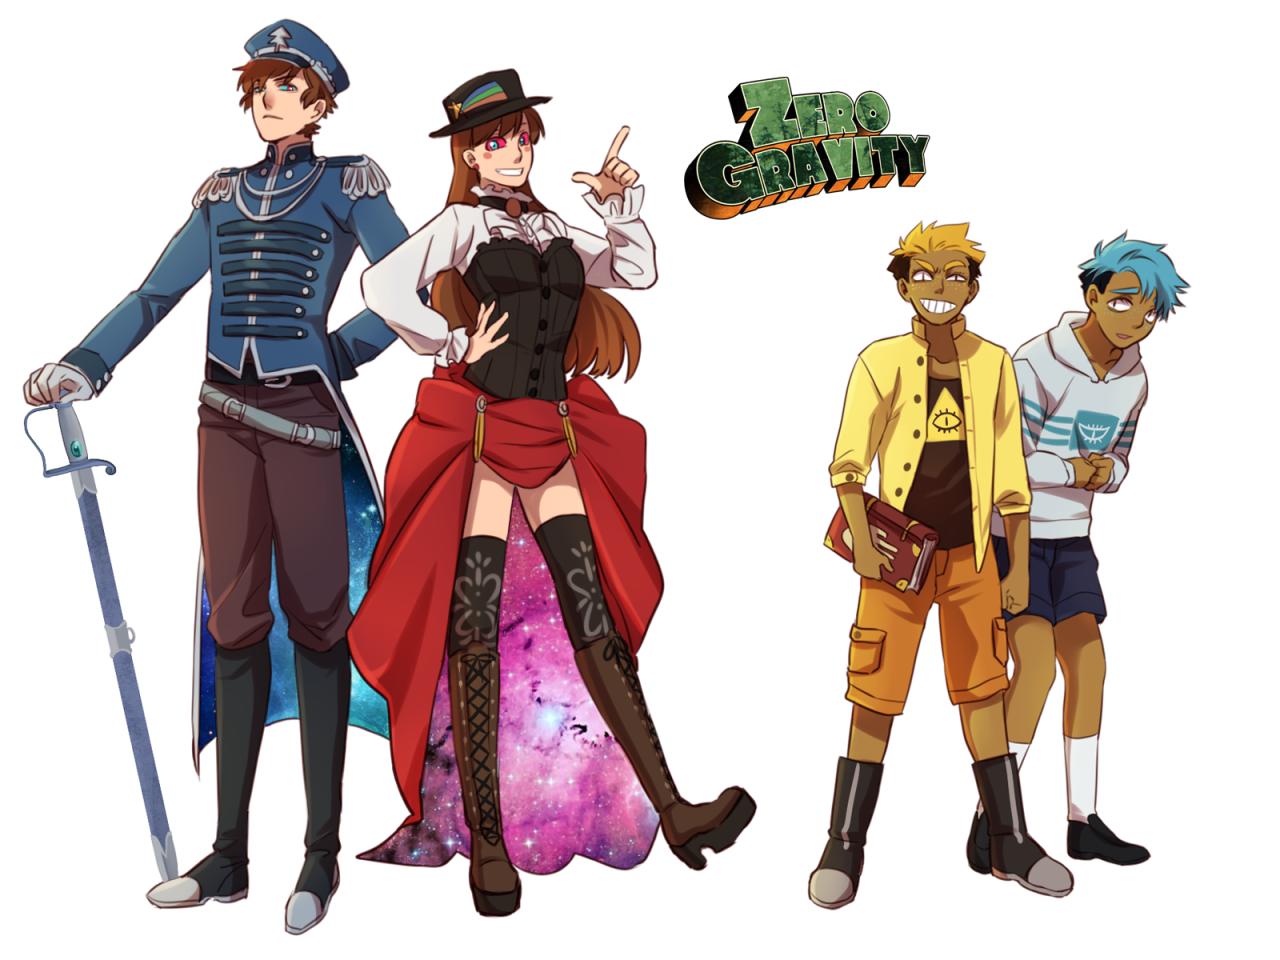 Reverse Falls Will Cipher Wallpaper Tano S Art Blog Zero Gravity Au Full Characters Design